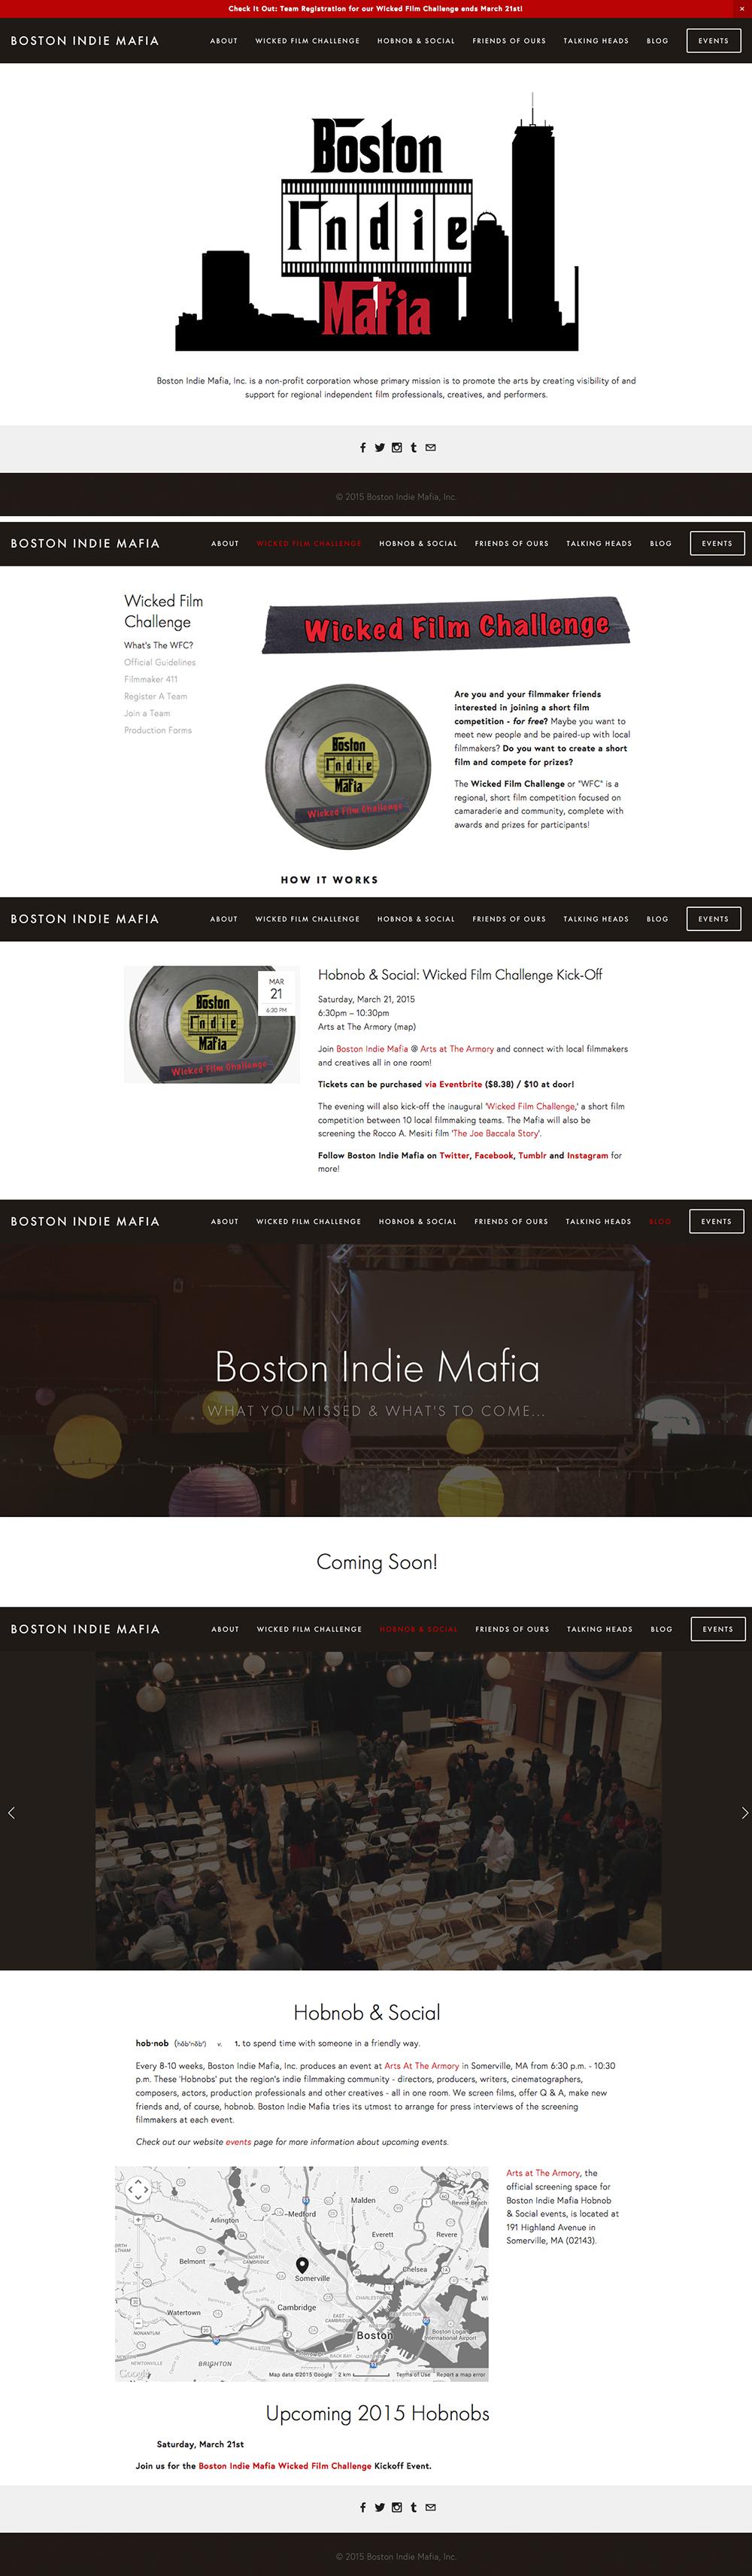 GeenaMatuson_BostonIndieMafia_Webdesign.jpg